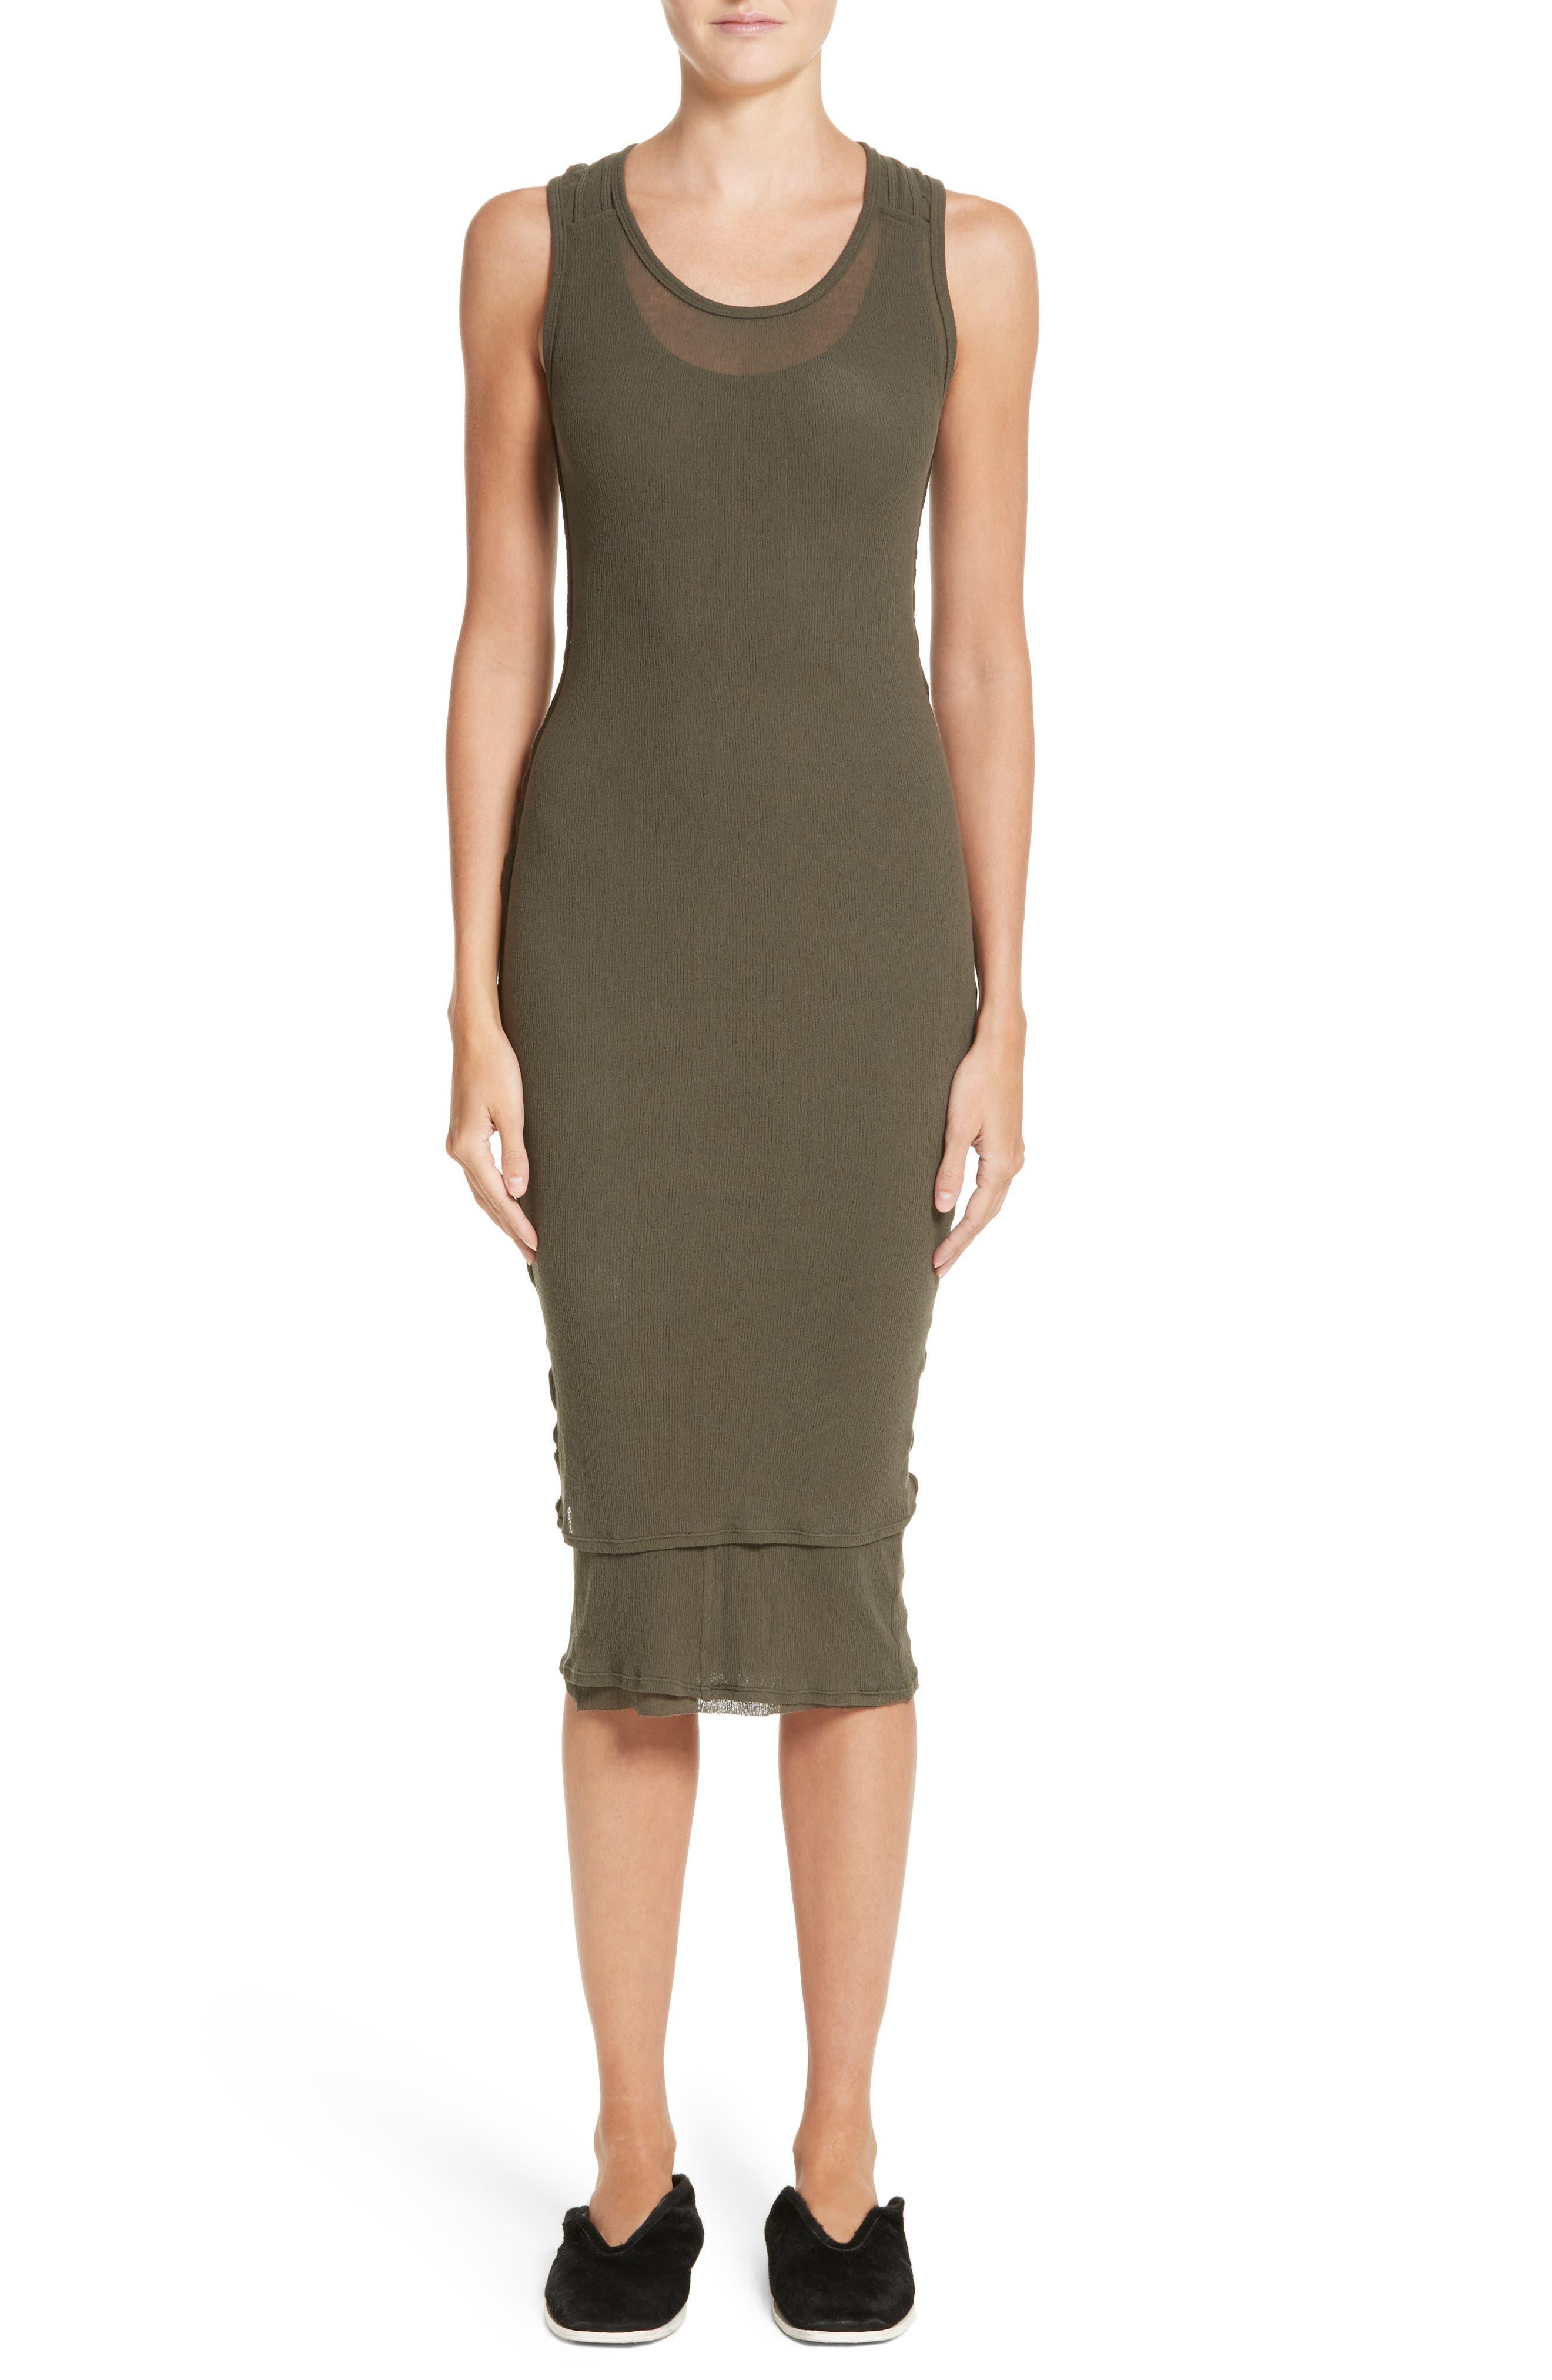 PSWL Jersey Gauze Dress,                         Main,                         color, Army